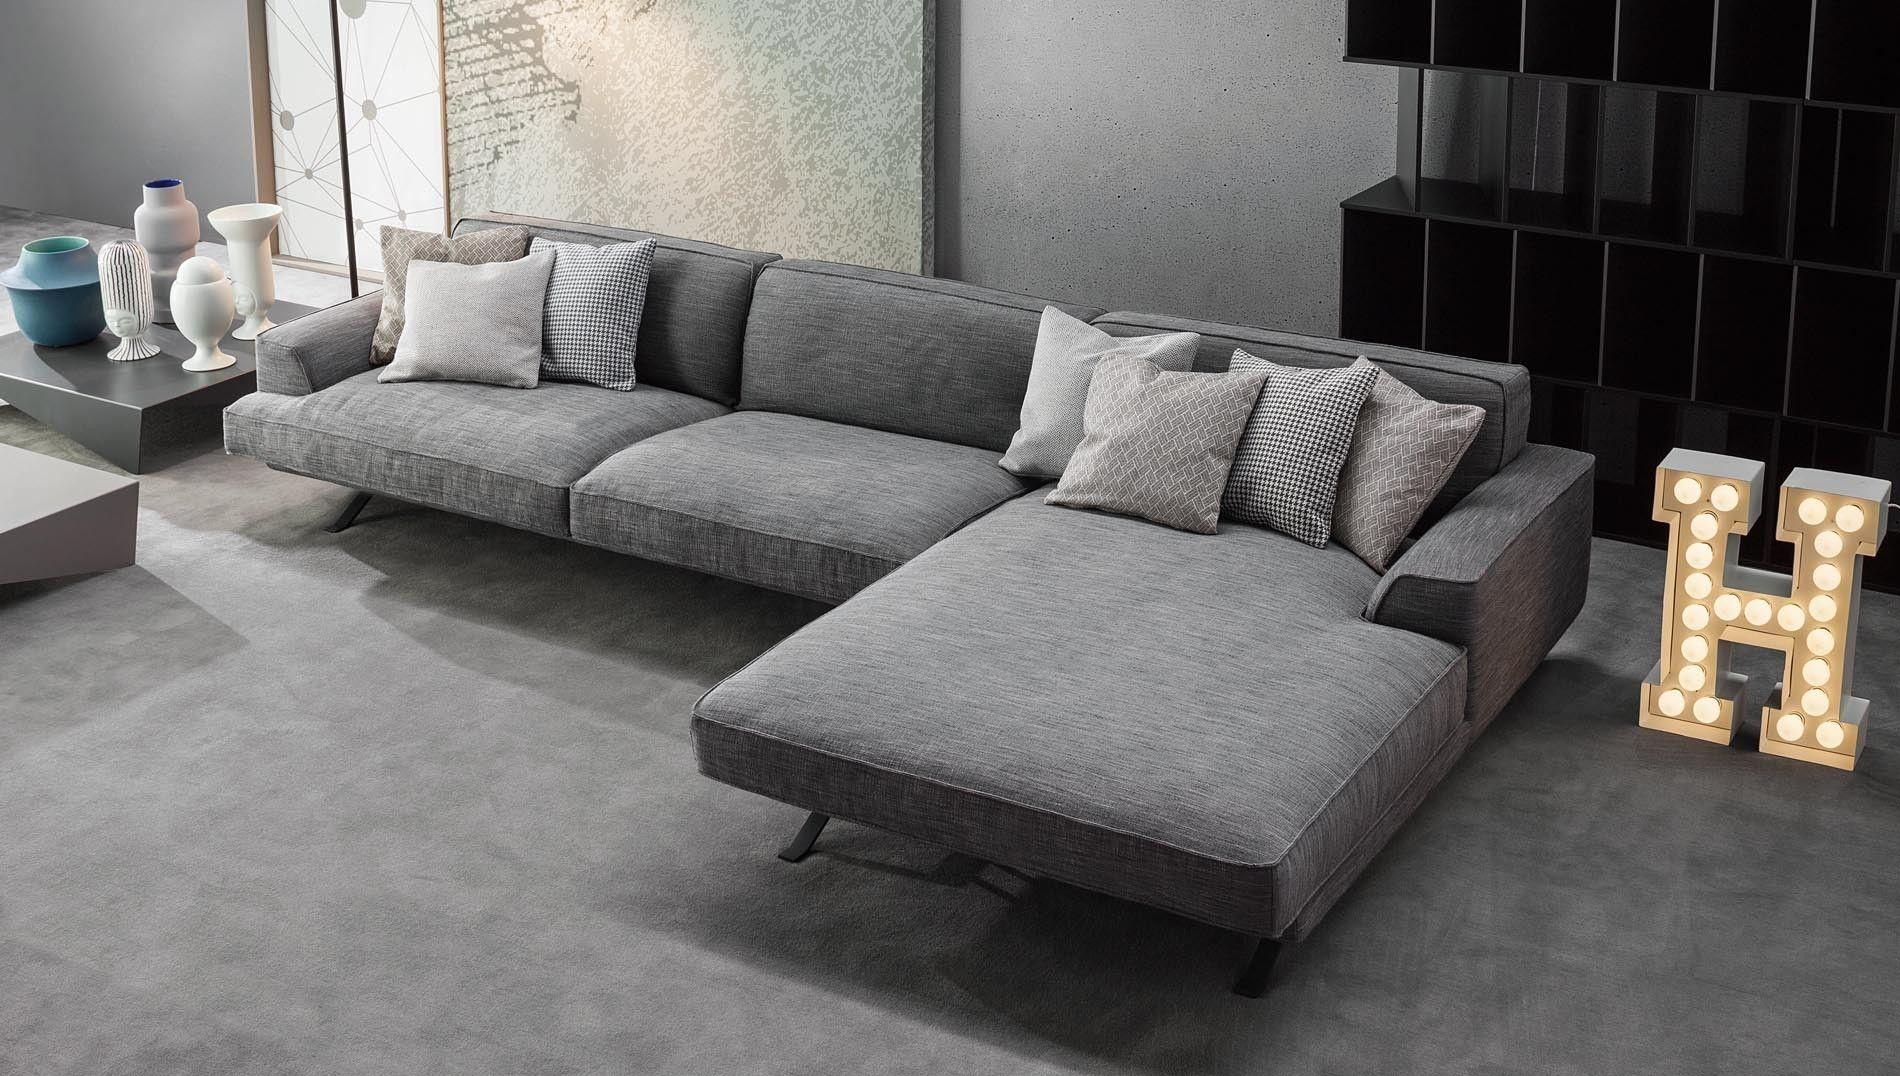 Groovy Bonaldo Slab Corner Sofa Buy Online At Luxdeco Sofa Creativecarmelina Interior Chair Design Creativecarmelinacom